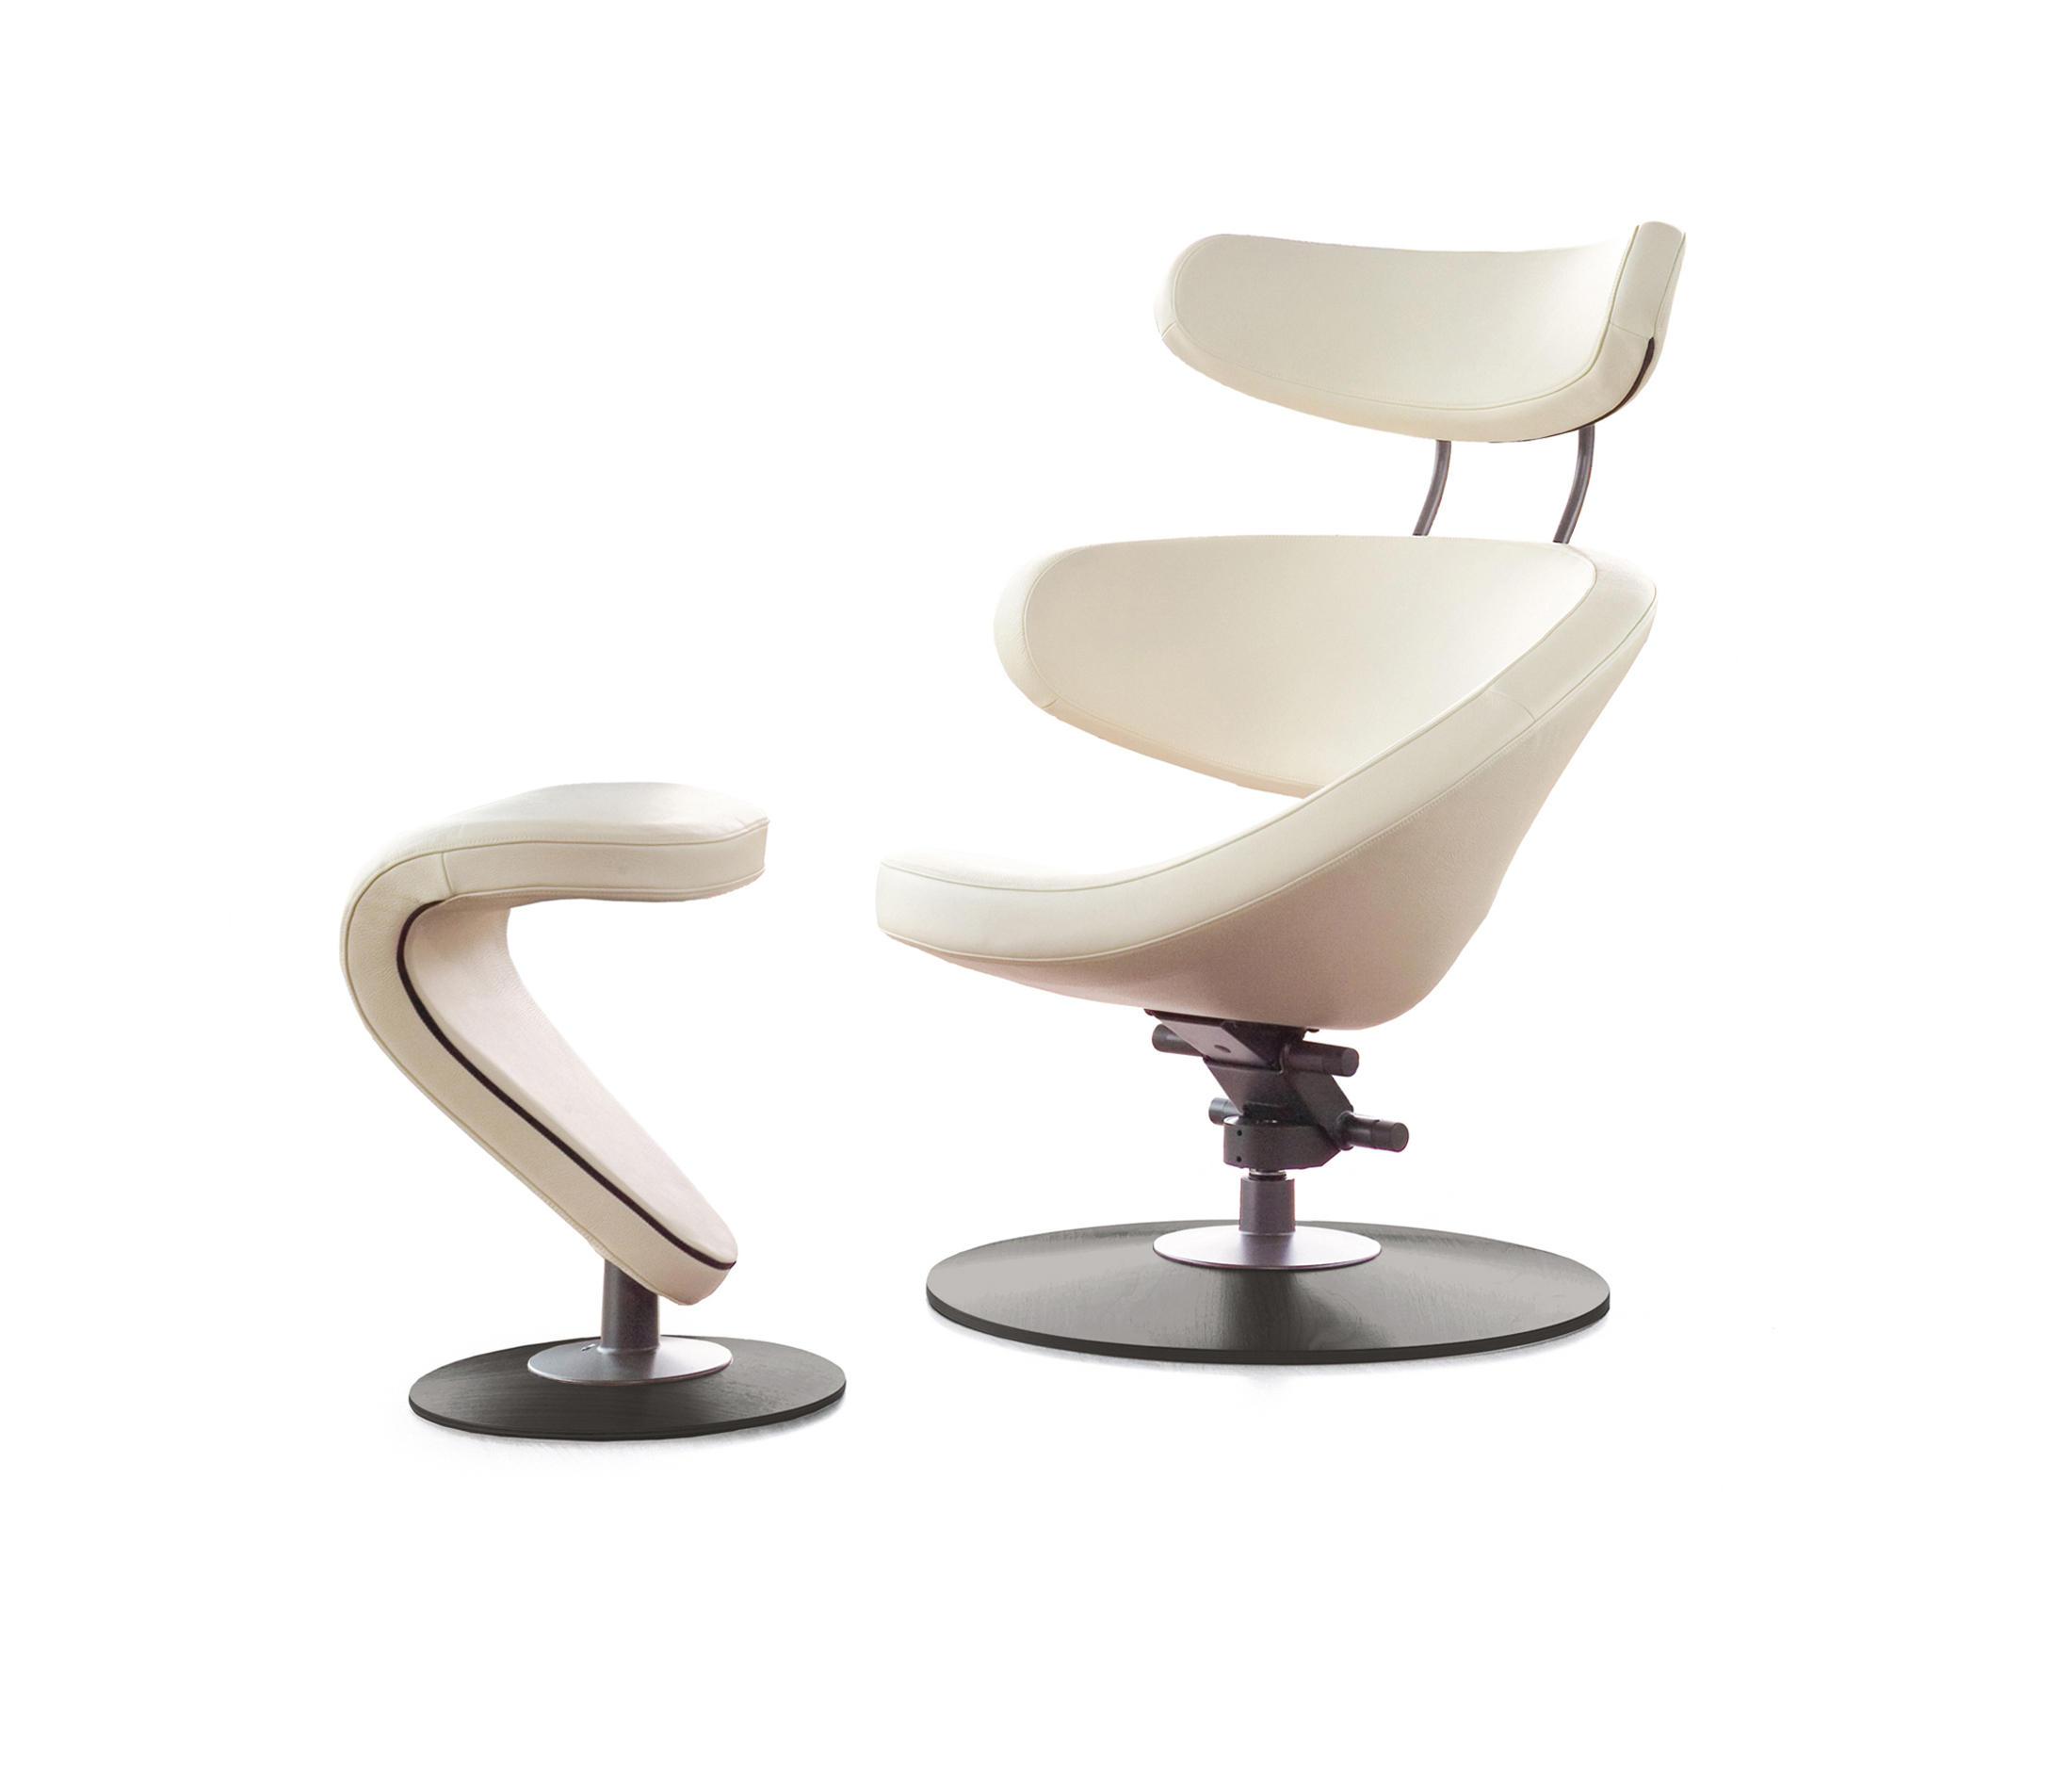 Poltrona Varier Peel.Peel Poltrone Varier Furniture Architonic